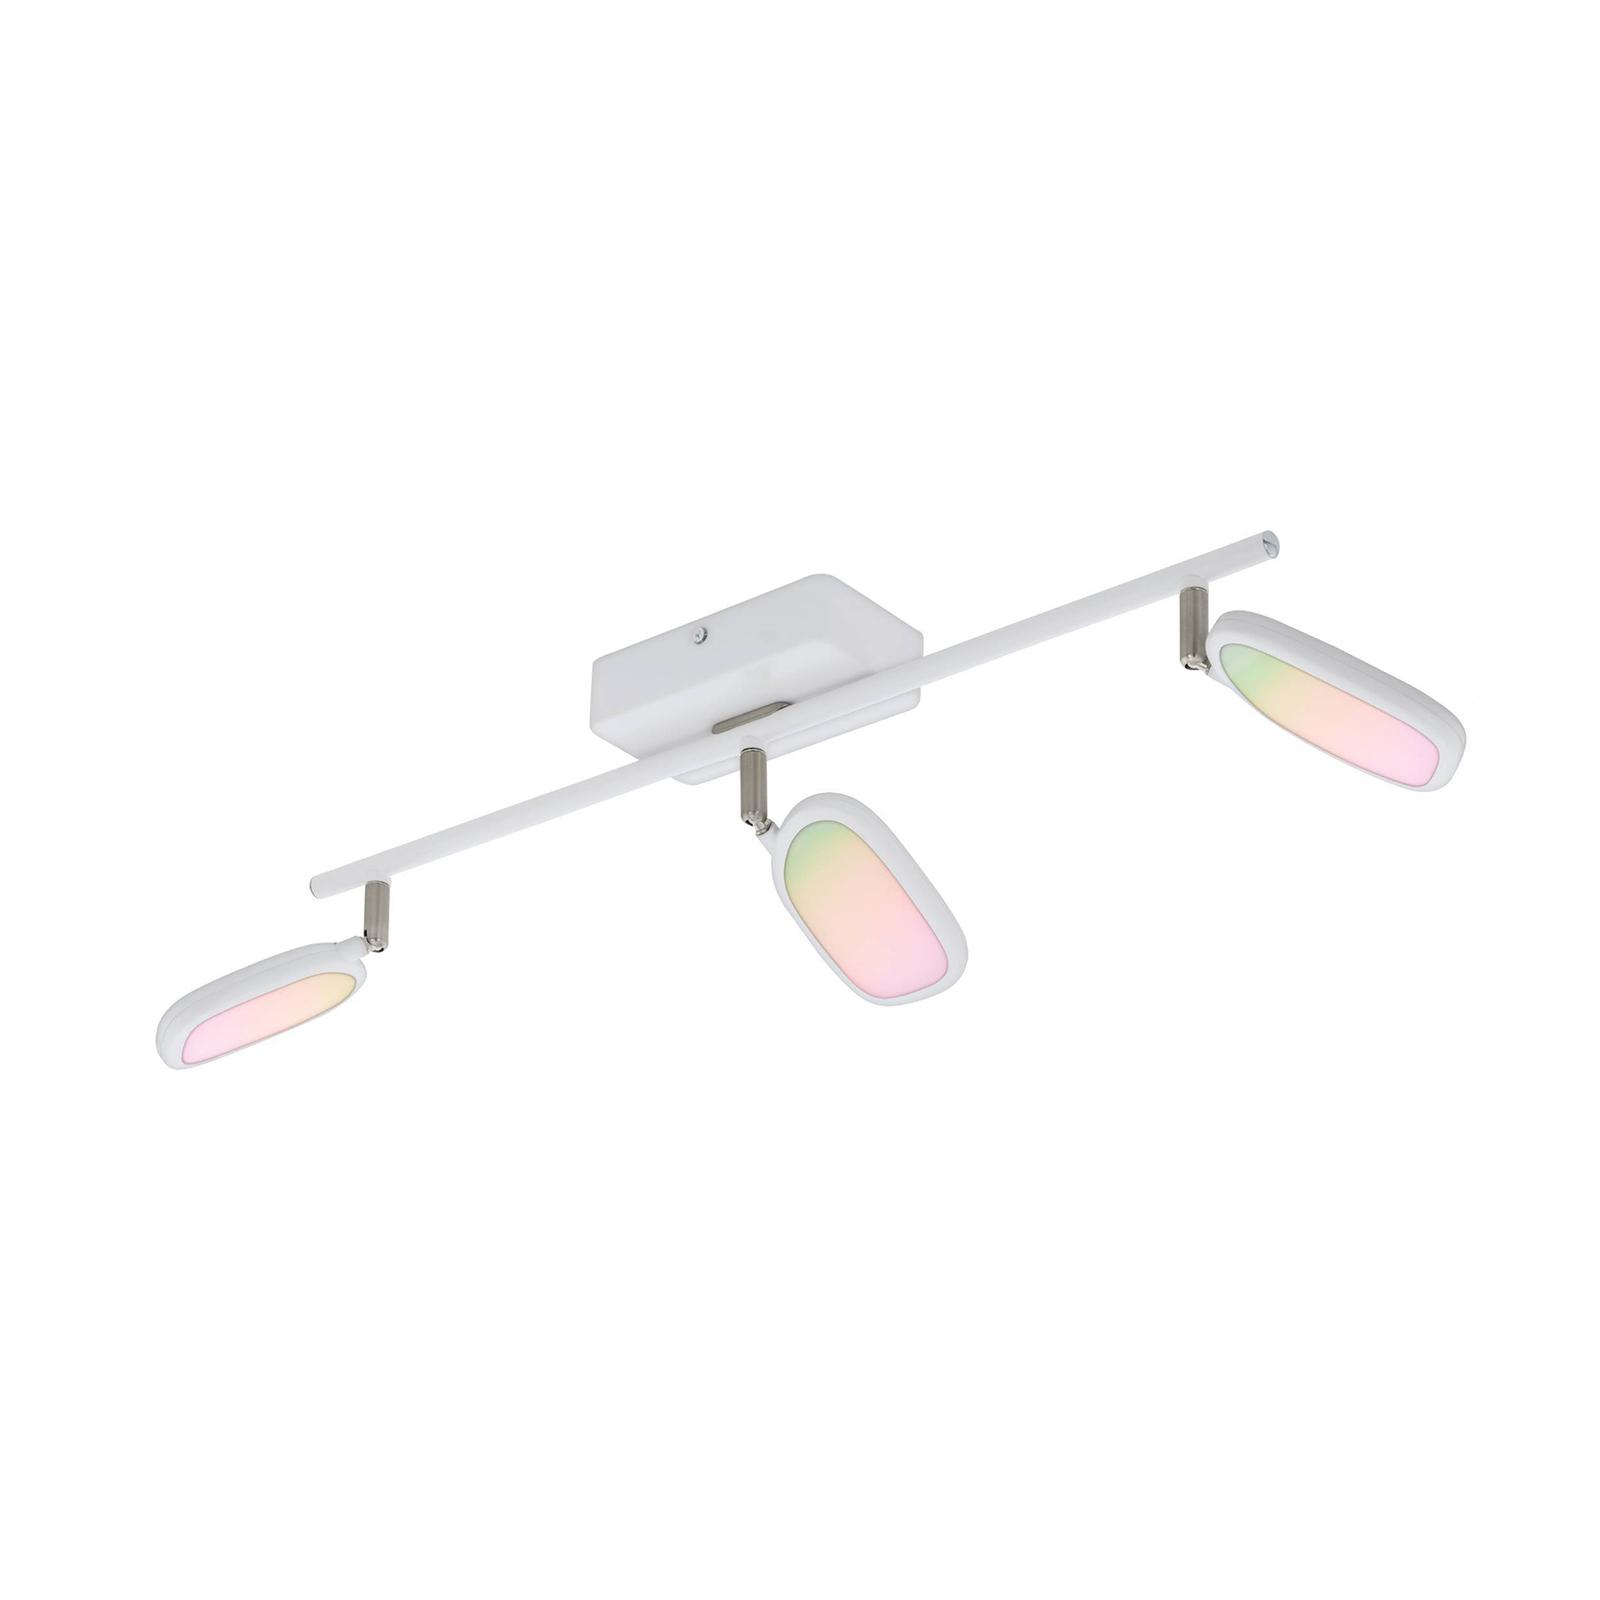 EGLO connect Palomable-C LED-takspot 3 lyskilder